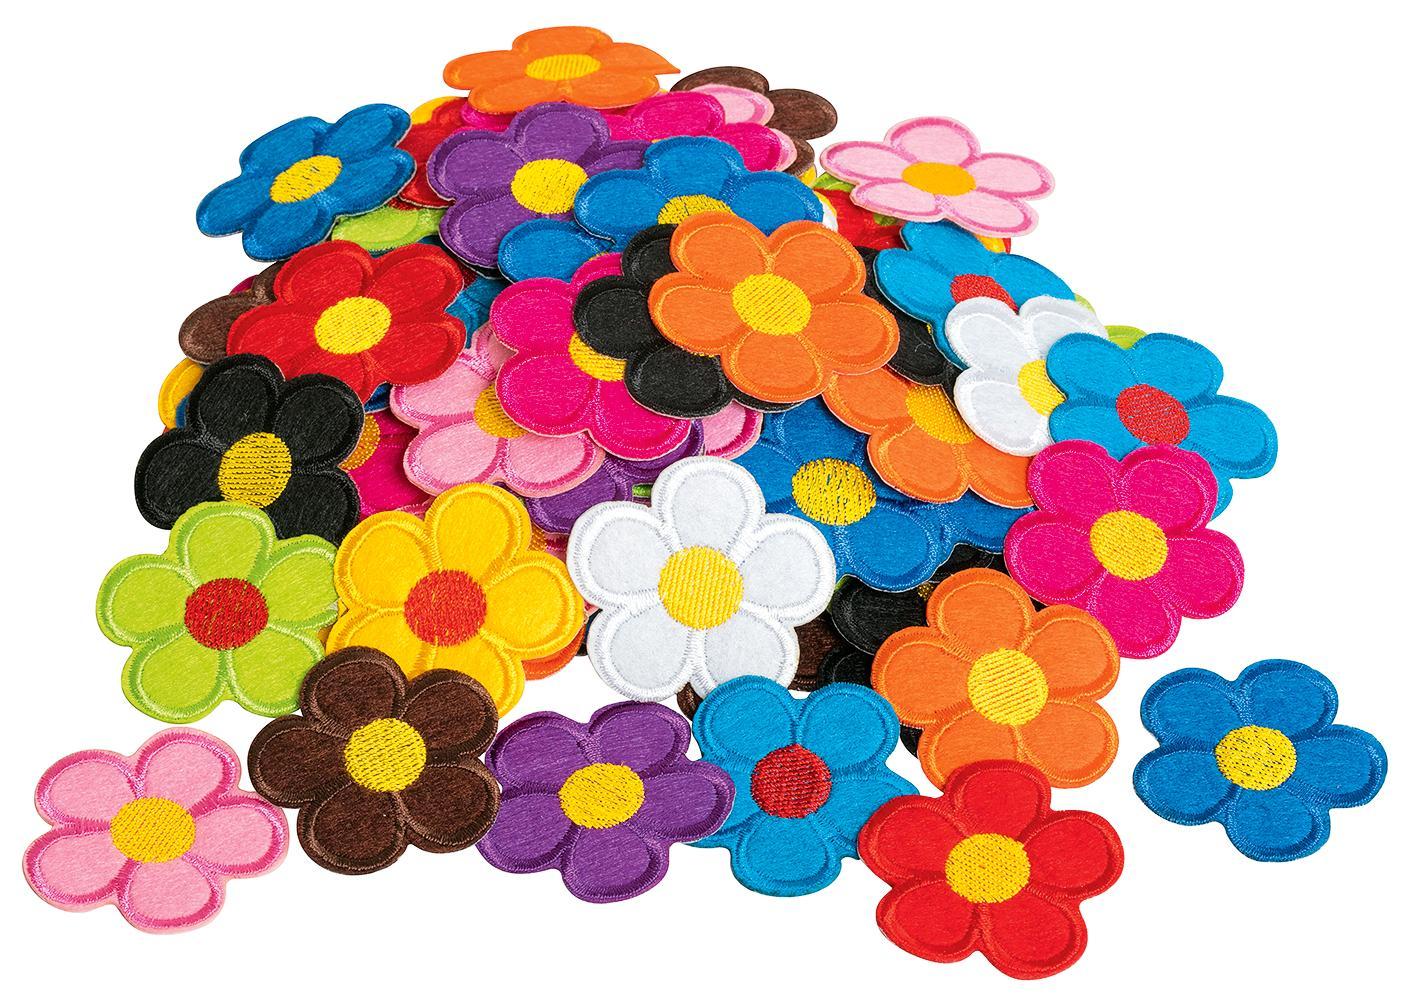 120 applications repasser m lange de fleurs gros acheteurs vbs loisirs cr atifs vbs hobby. Black Bedroom Furniture Sets. Home Design Ideas